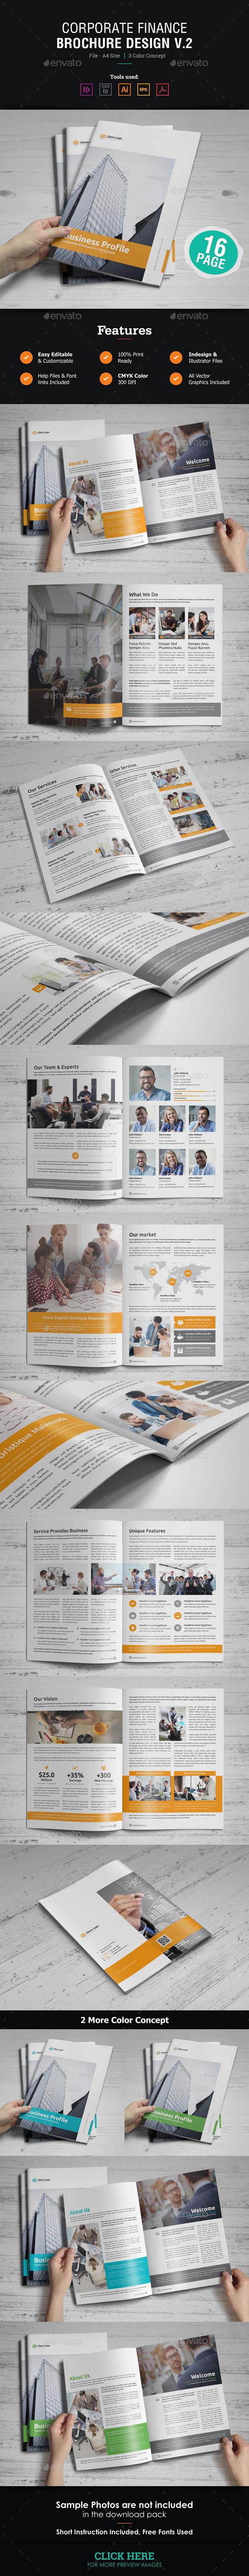 Corporate Brochure Design v2 - Corporate Brochures